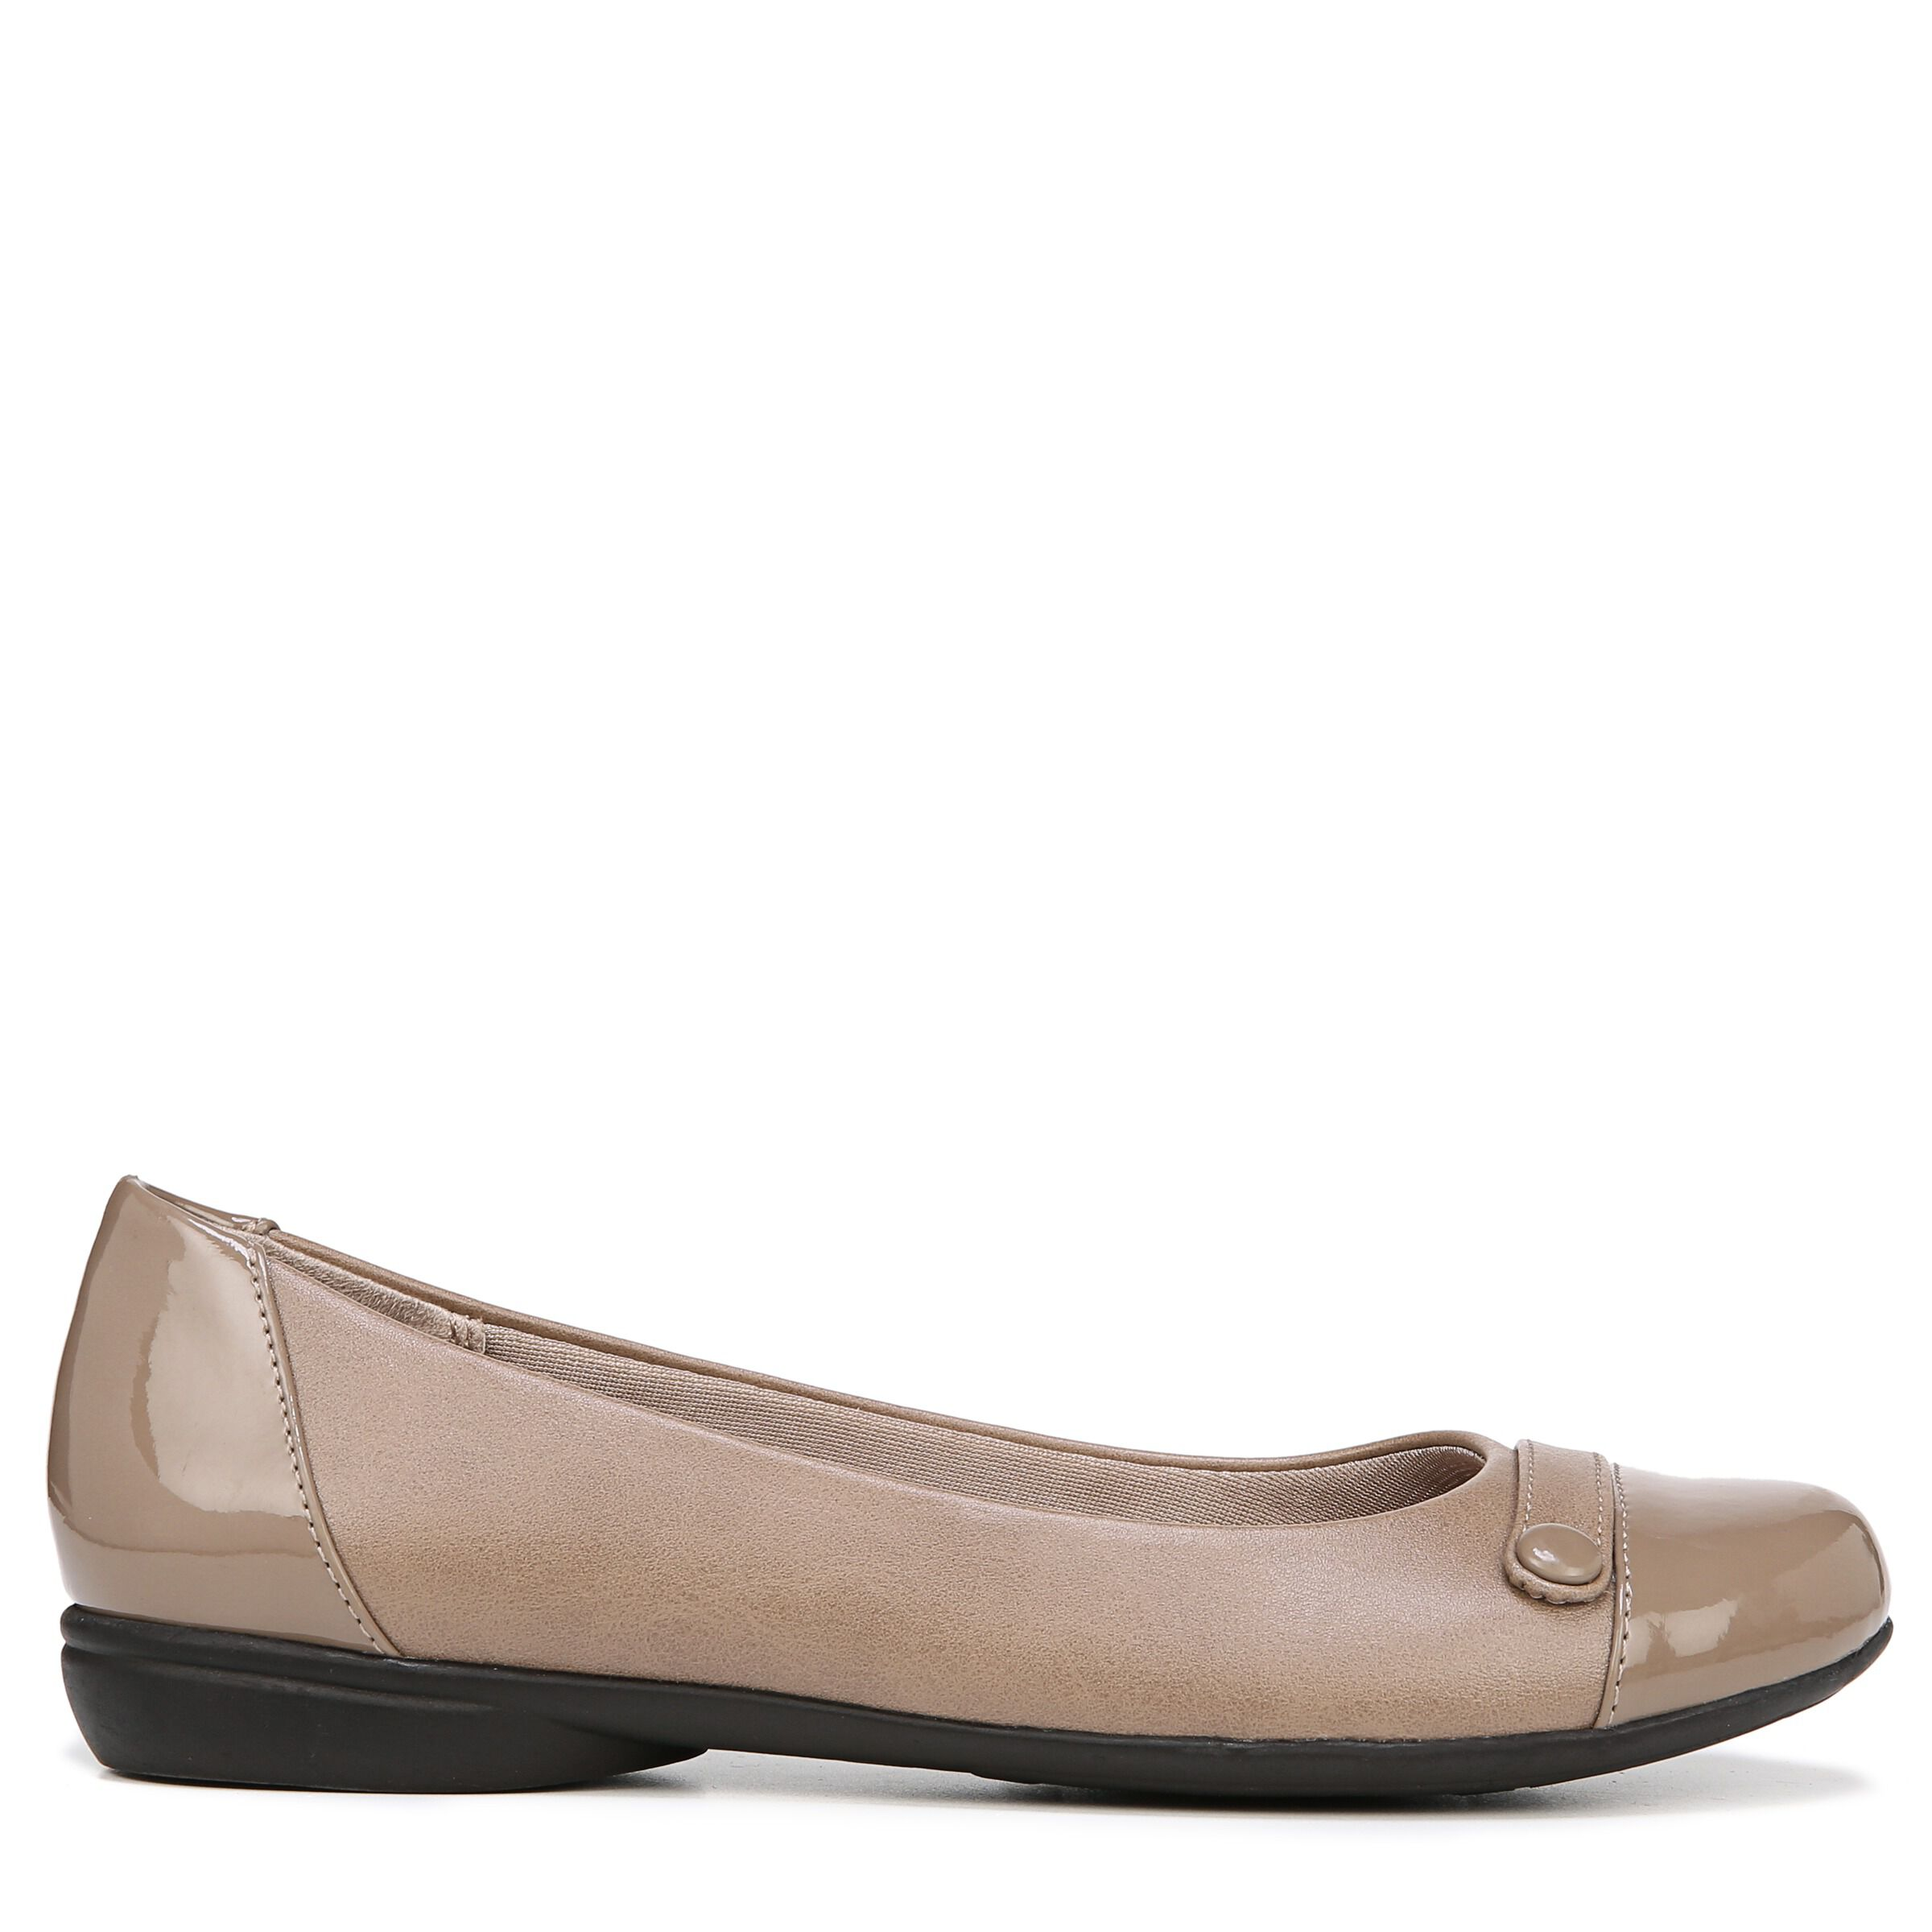 uk shoes_kd5791